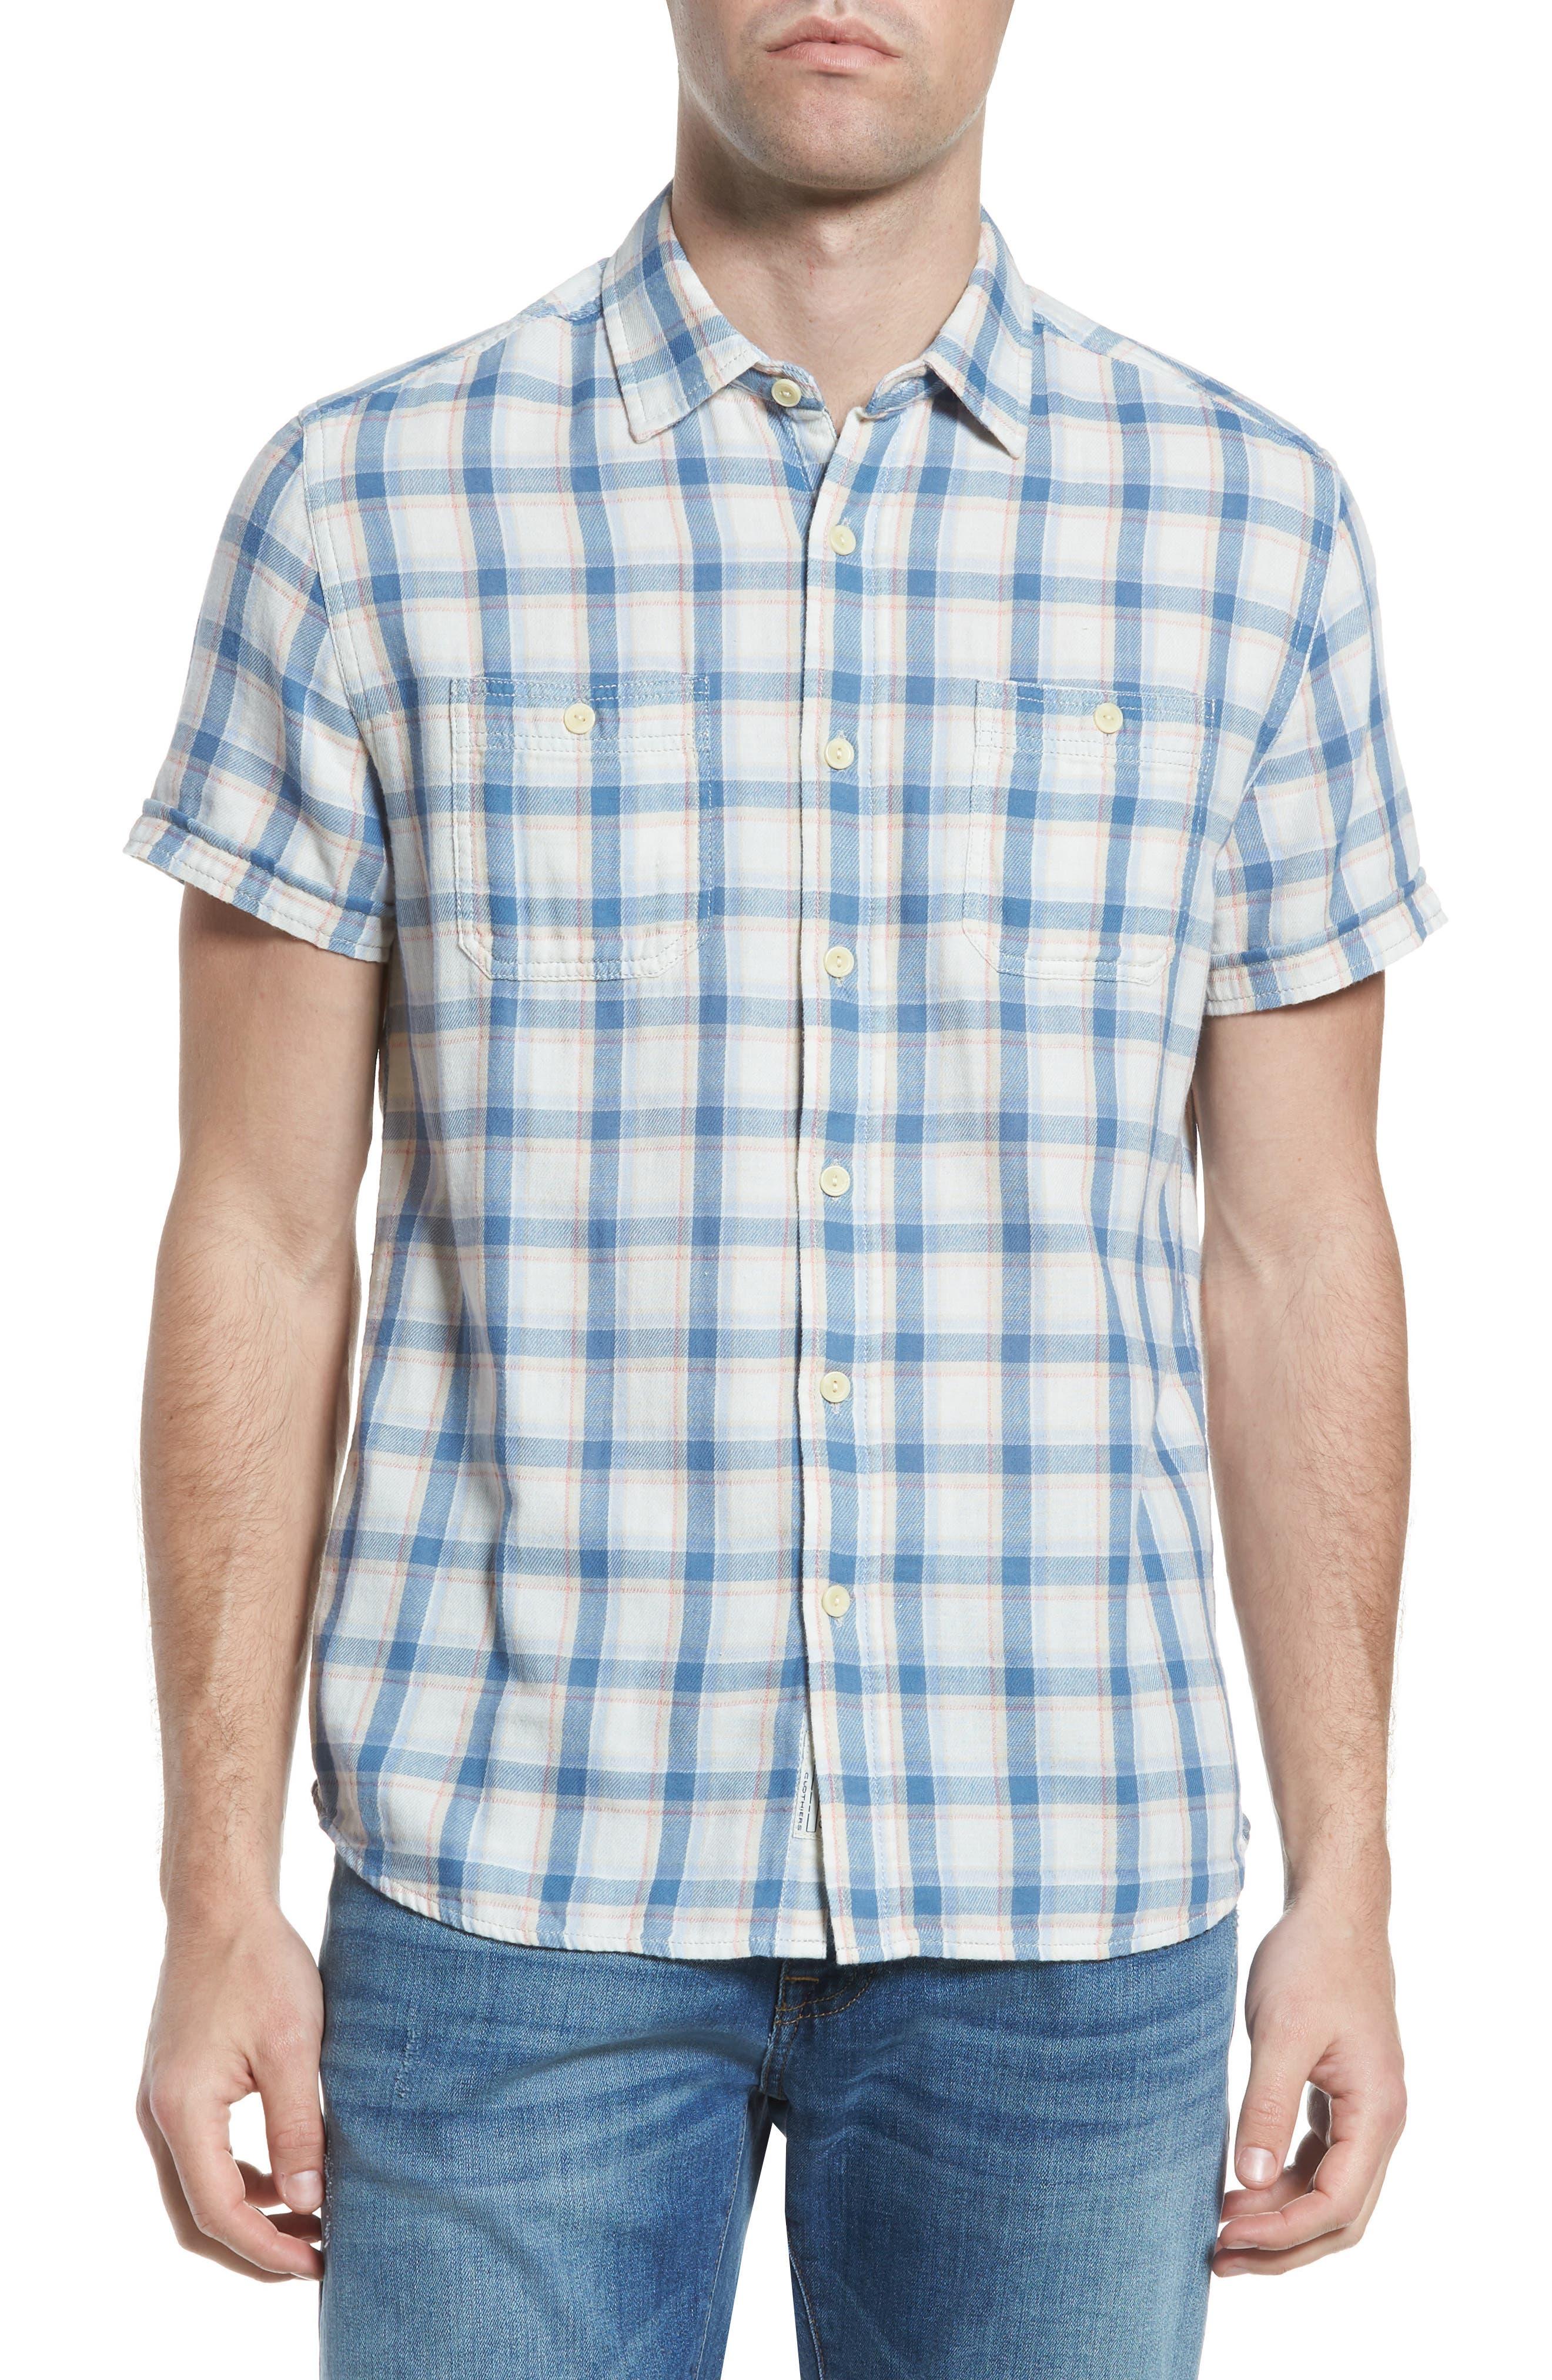 Larson Short Sleeve Sport Shirt,                             Main thumbnail 1, color,                             Cream Blue Plaid